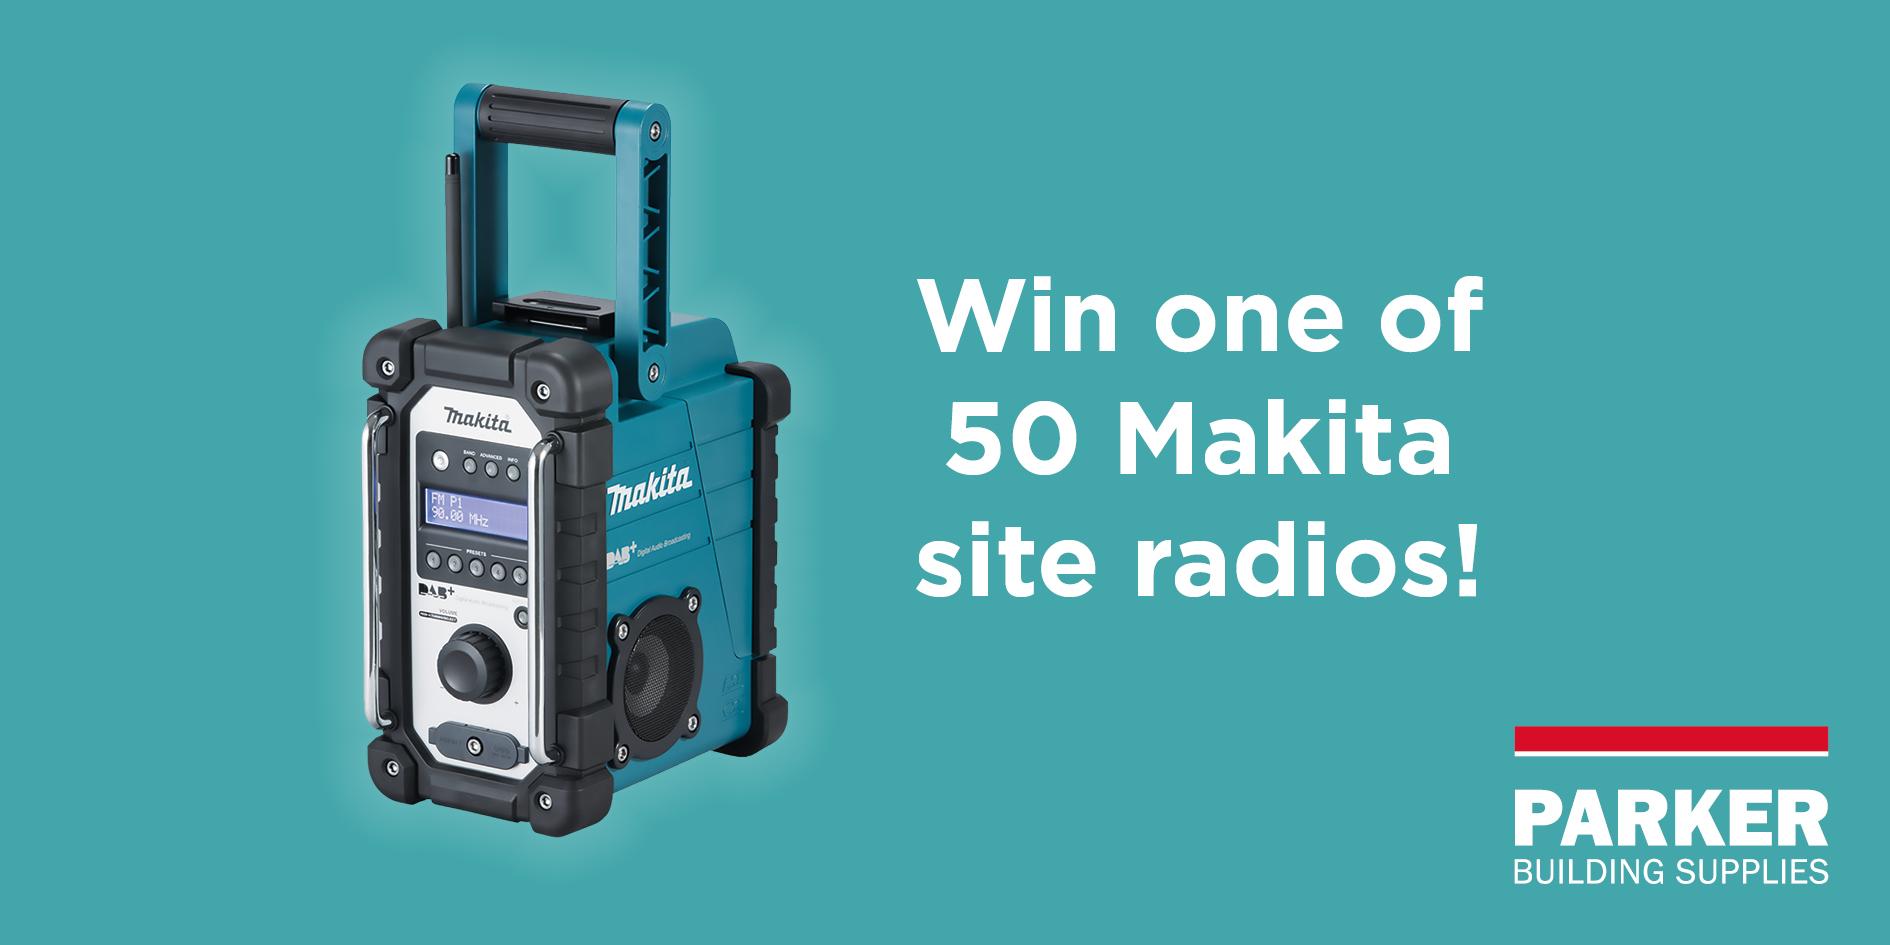 Win one of 50 Makita DAB site radios!